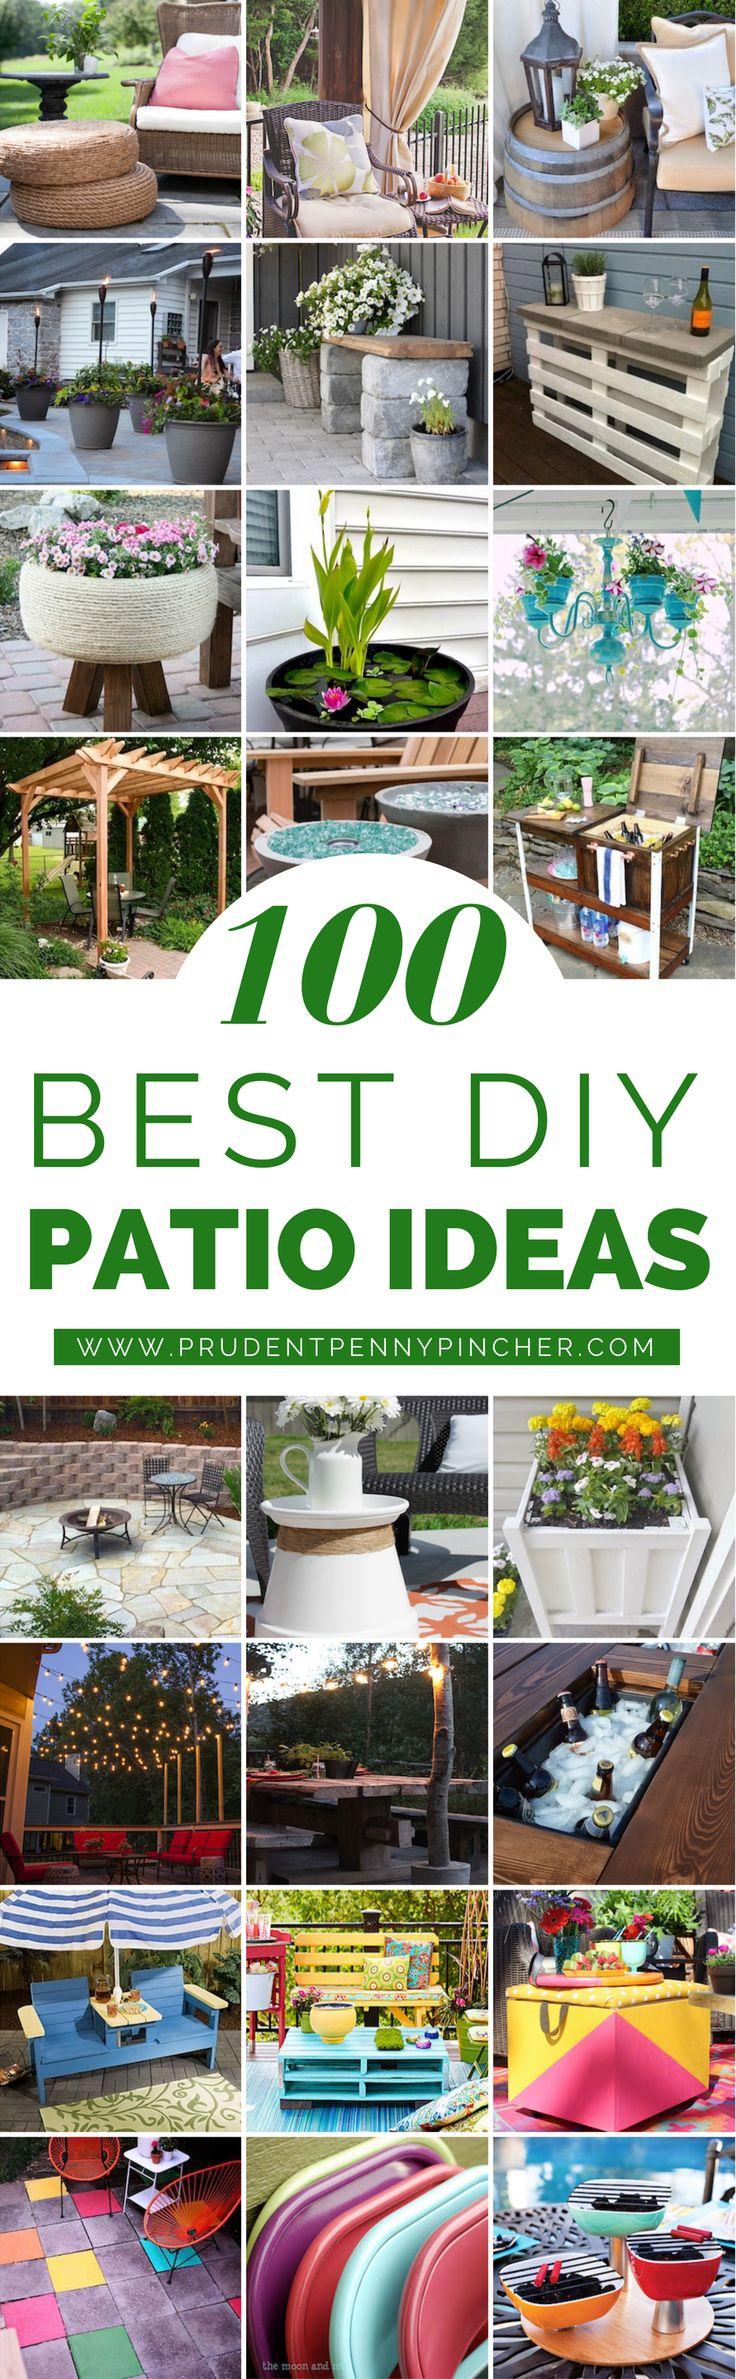 100 Best DIY Outdoor Patio Ideas 68